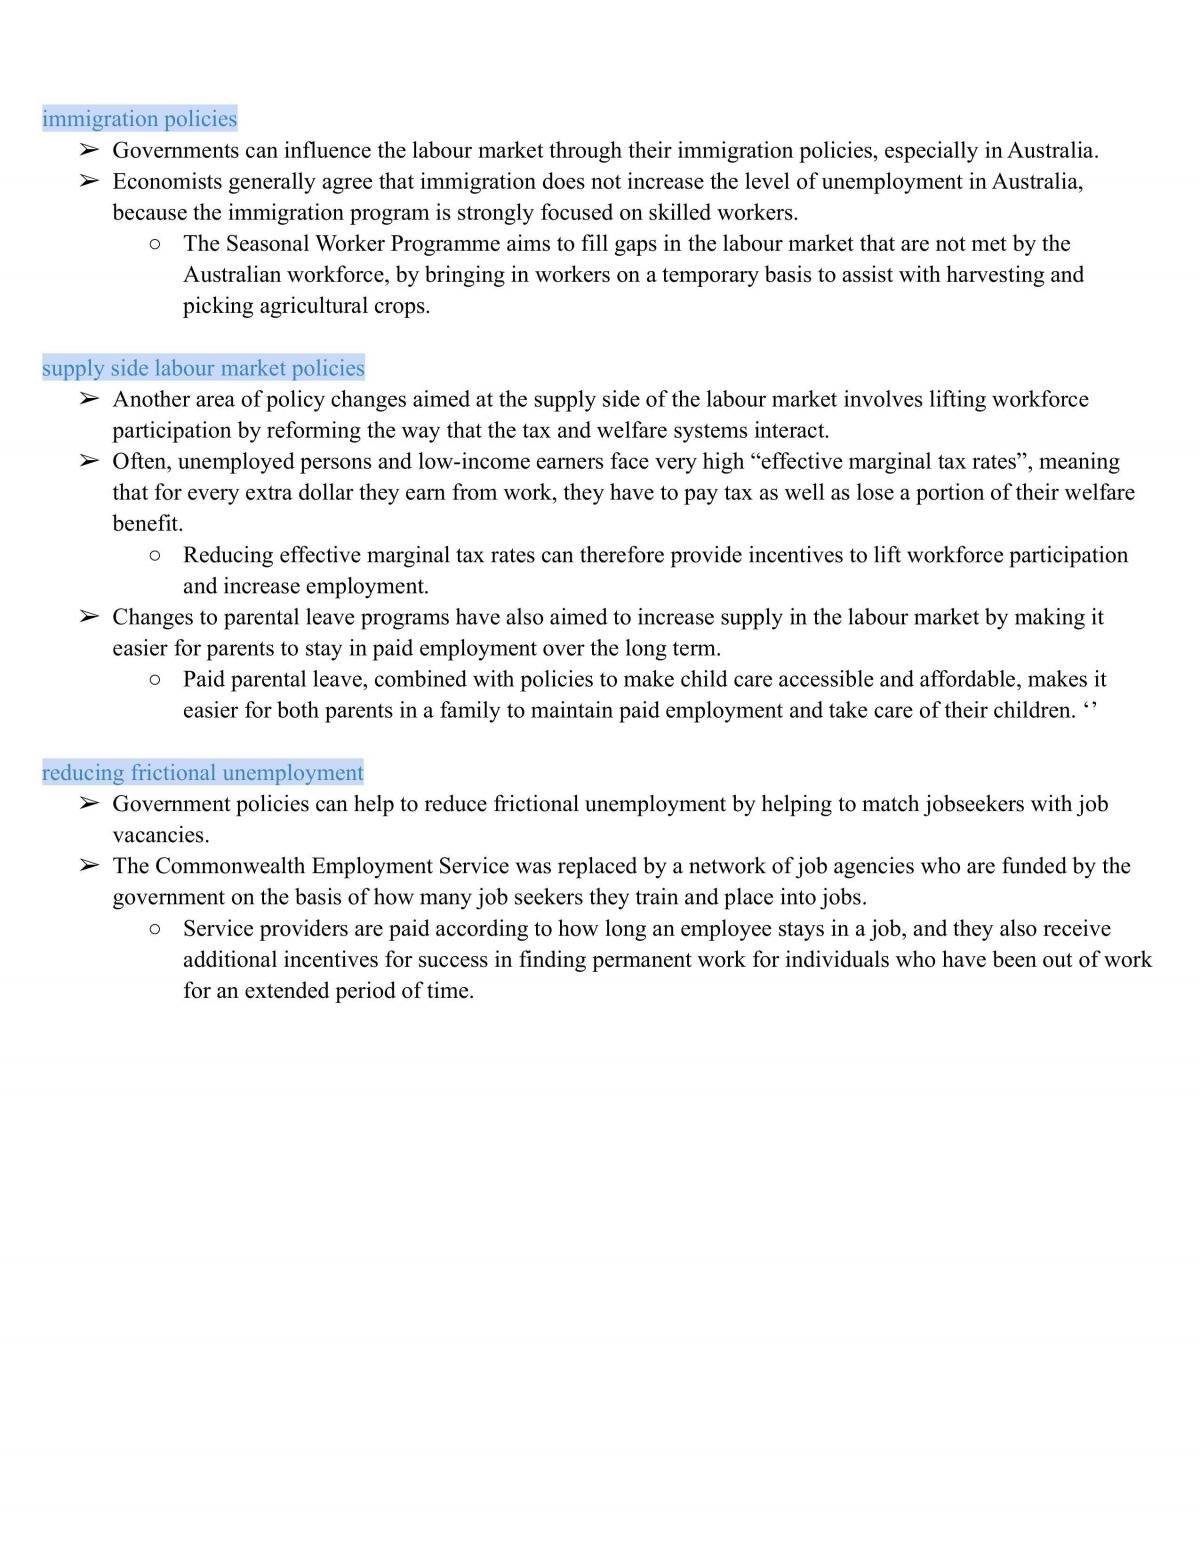 Economics - Topic 3: Economic Issues (notes) - Page 15